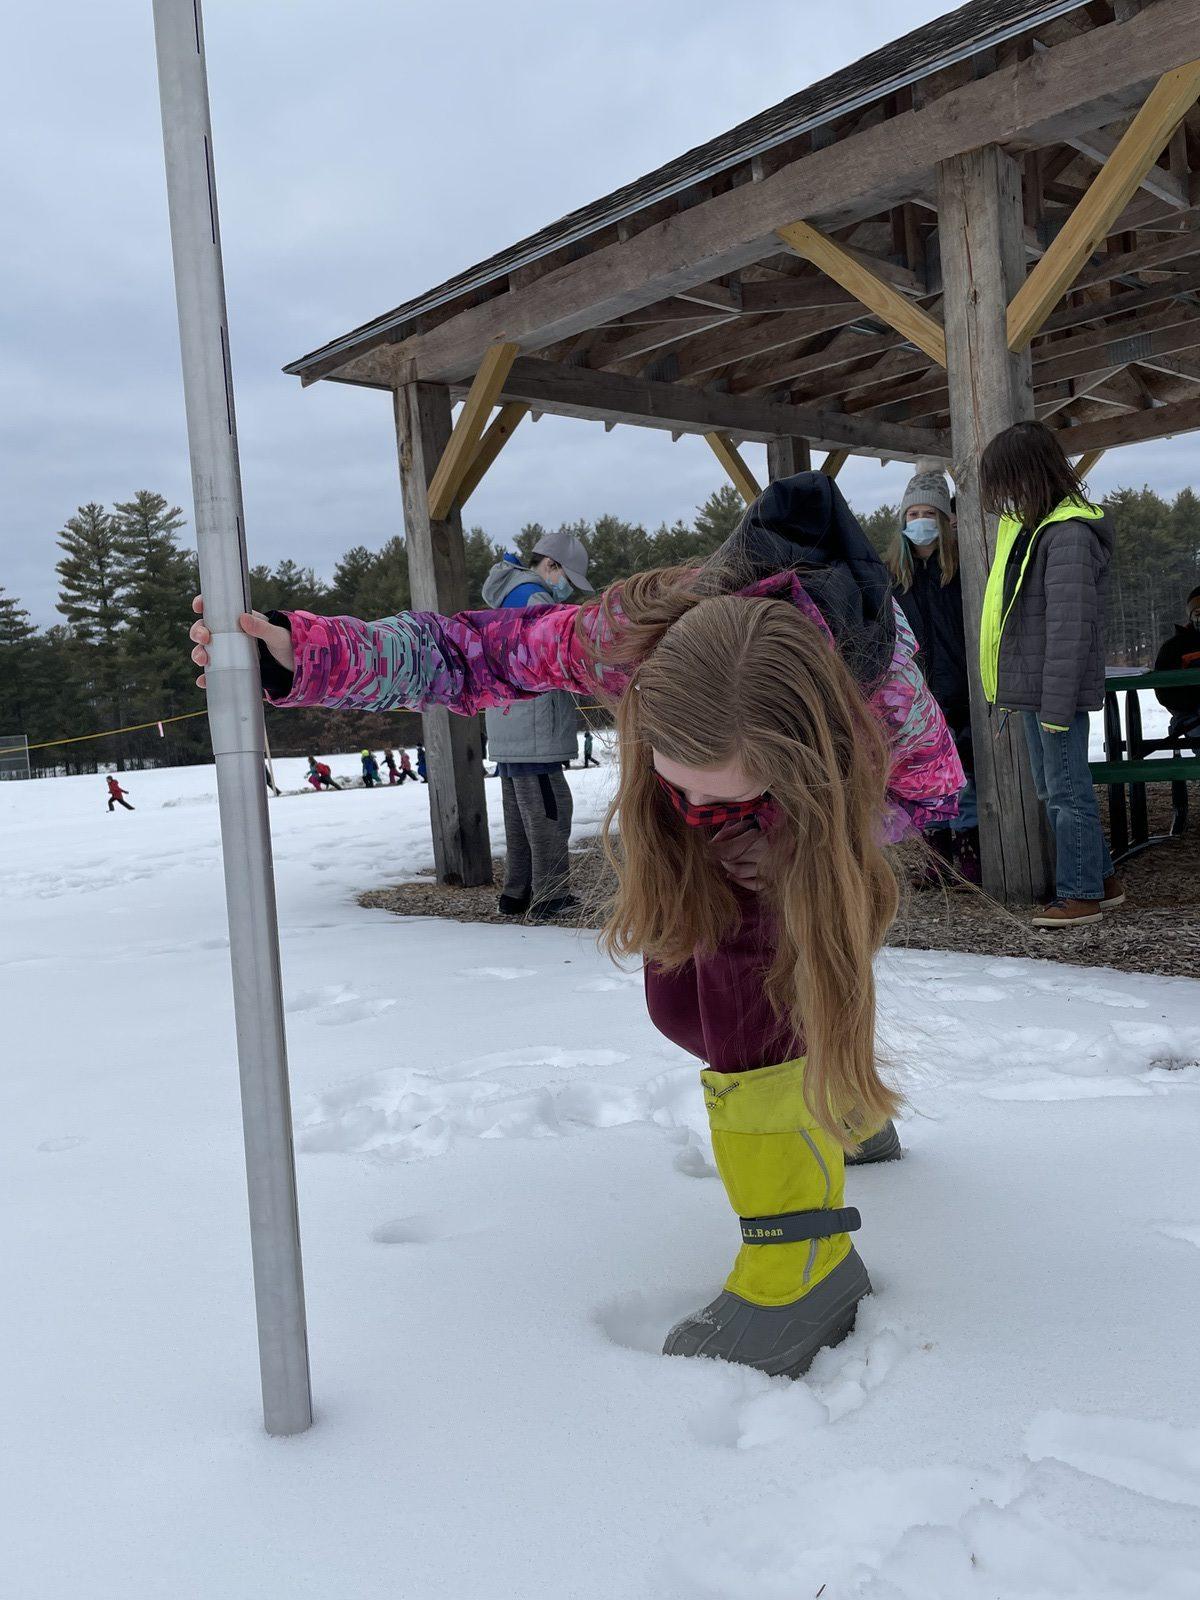 Week 1 6 8 Grade Molly Ockett Winter Games 2021 Moment of the Week